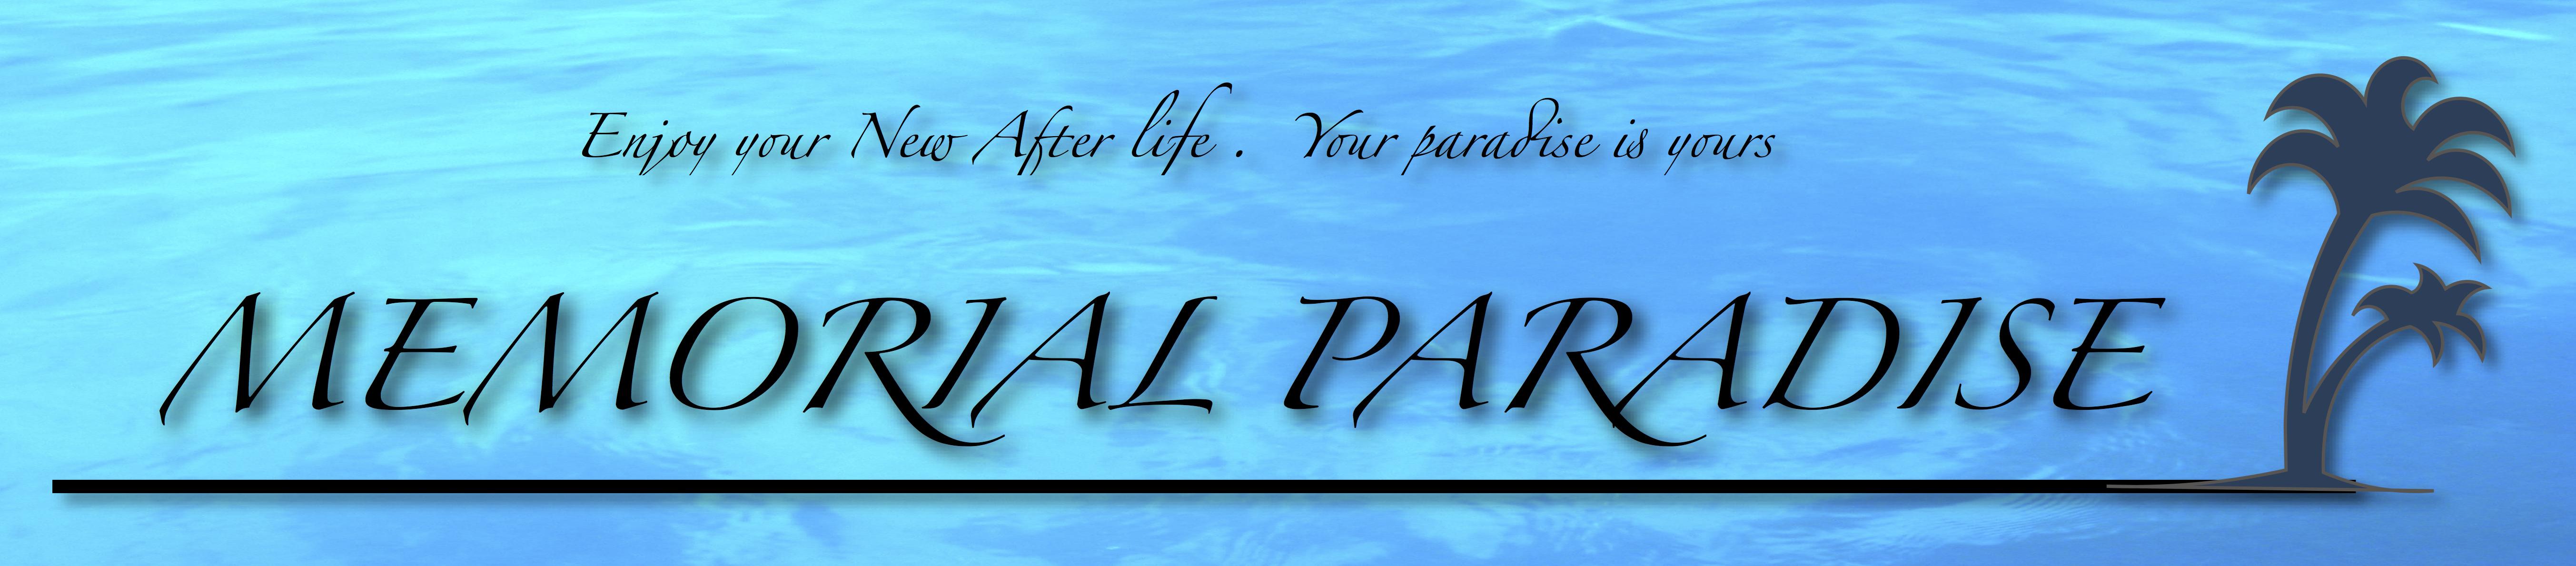 Memorial Paradise-メモリアルパラダイス